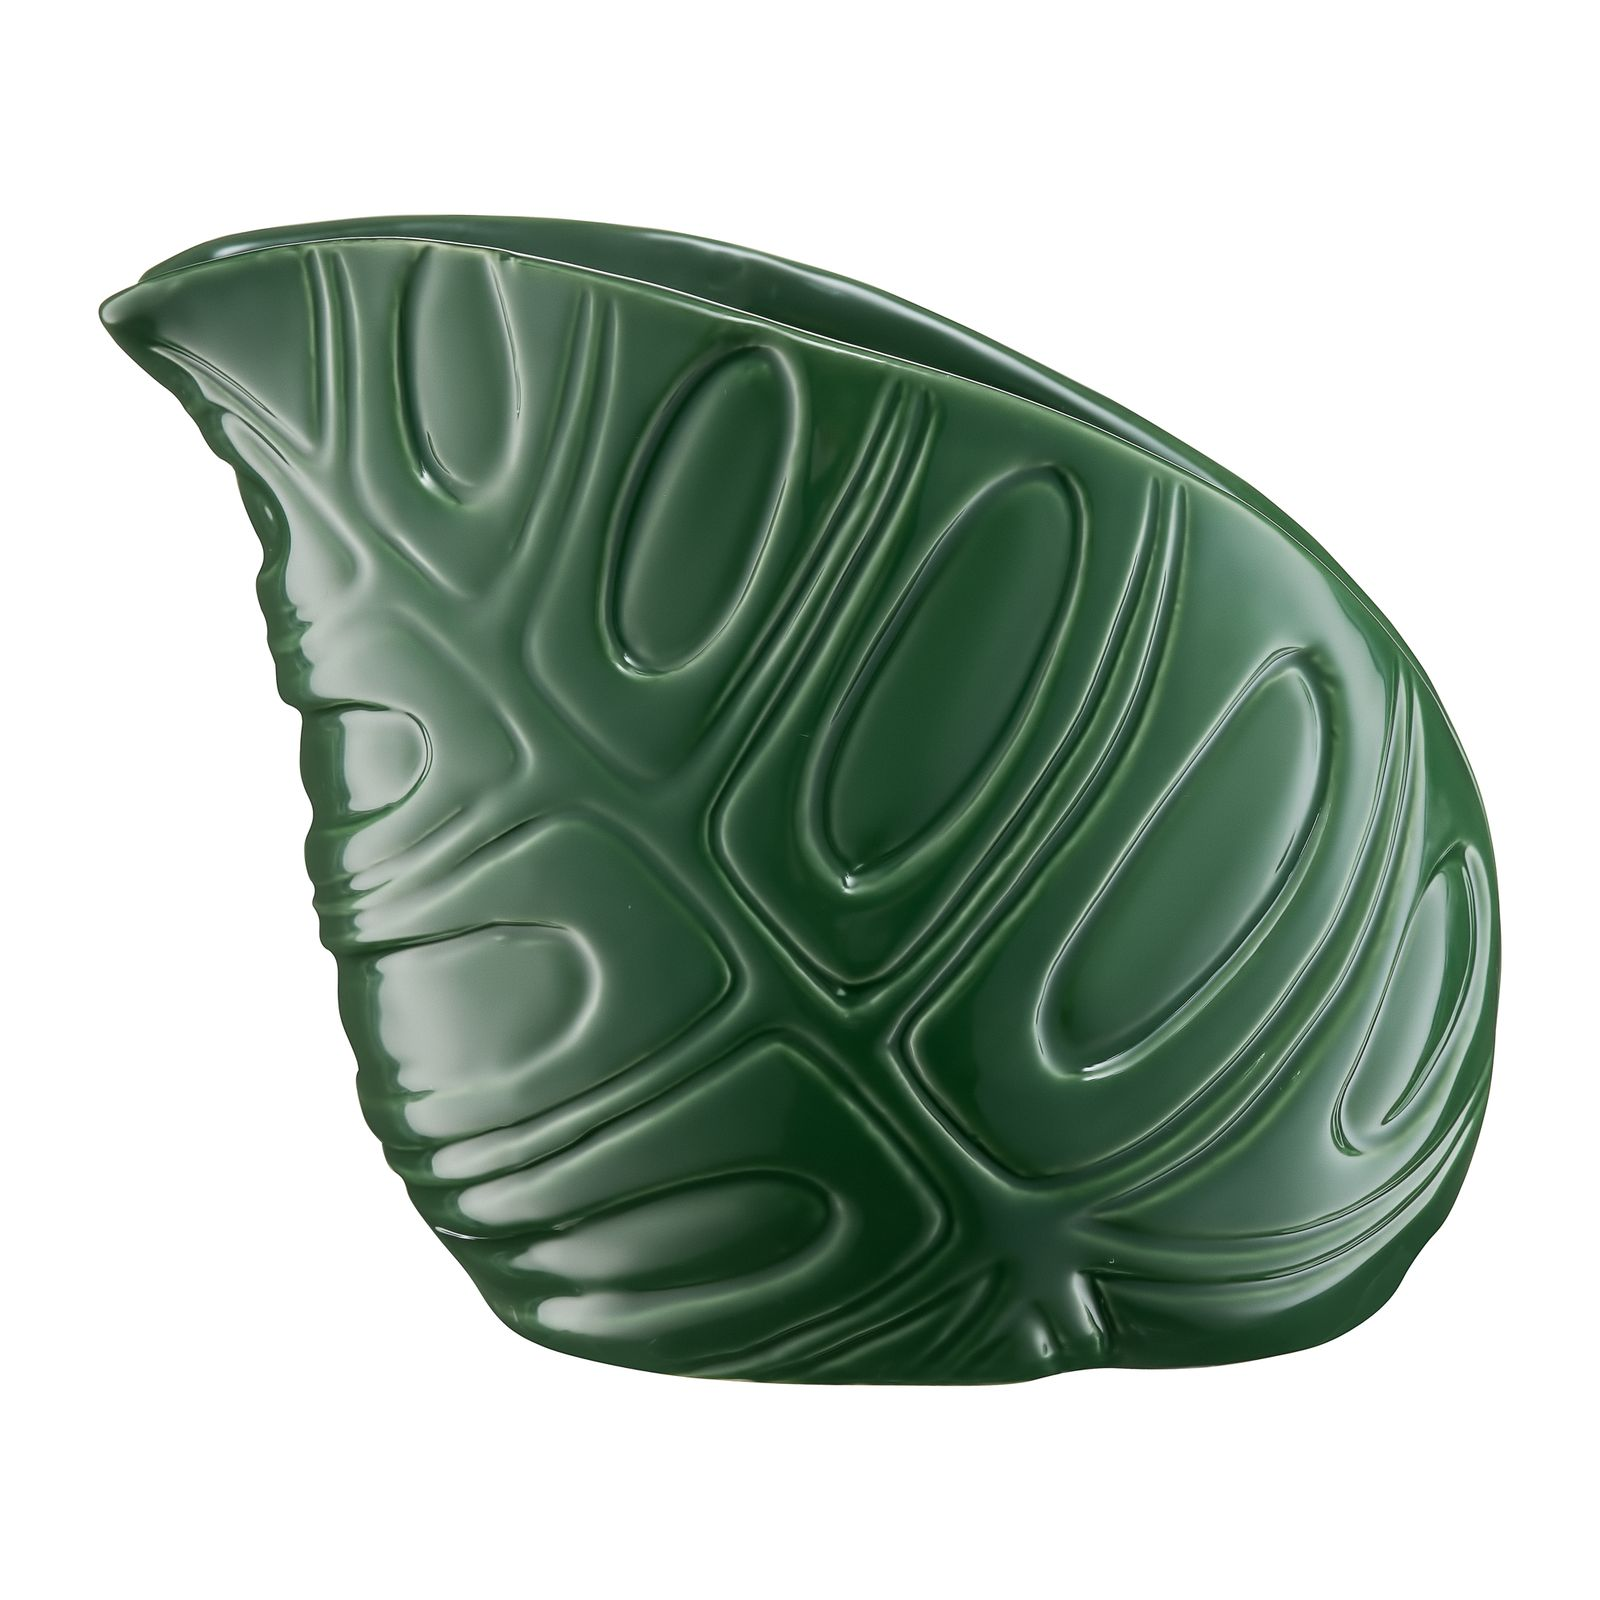 Vaso decorativo Leaf 12,5 x 8,5 x 11,5 cm MY HOME